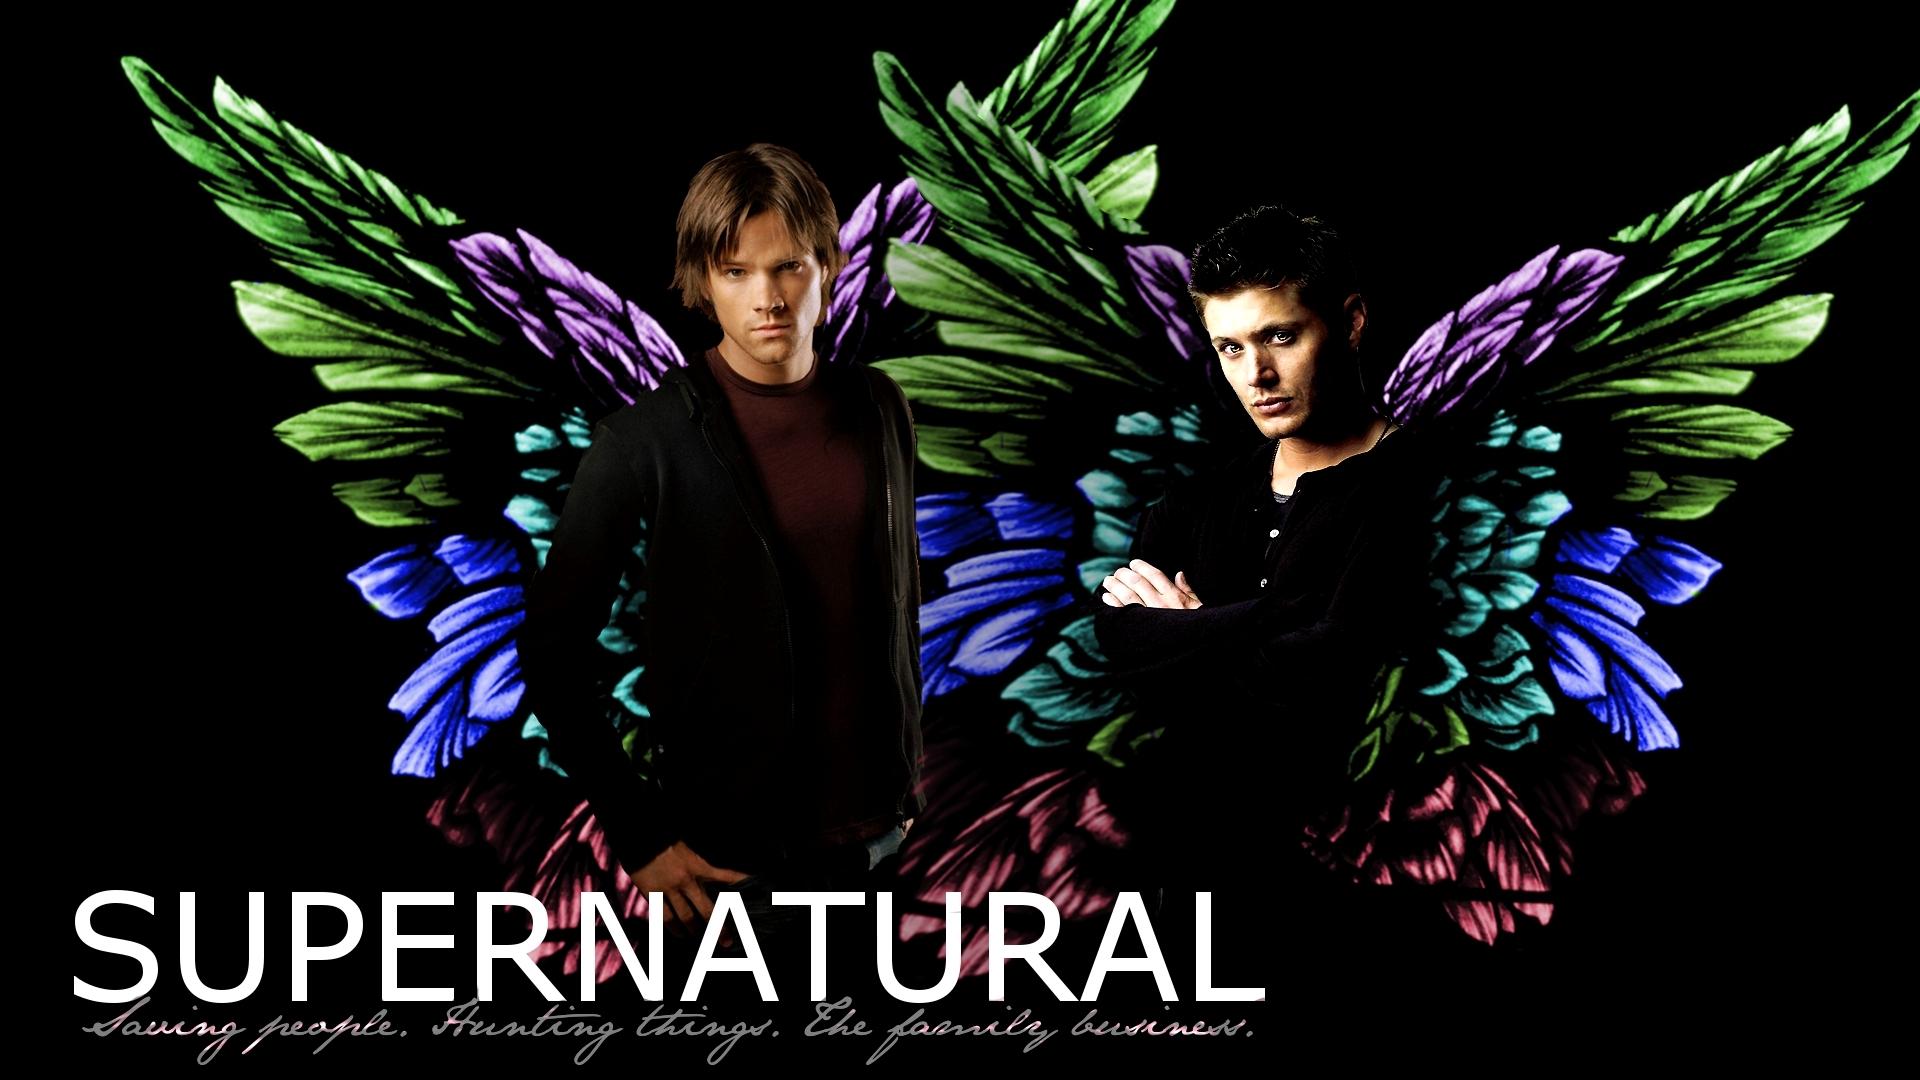 Supernatural Wallpaper Dean Quotes Supernatural Hd Backgrounds Pixelstalk Net